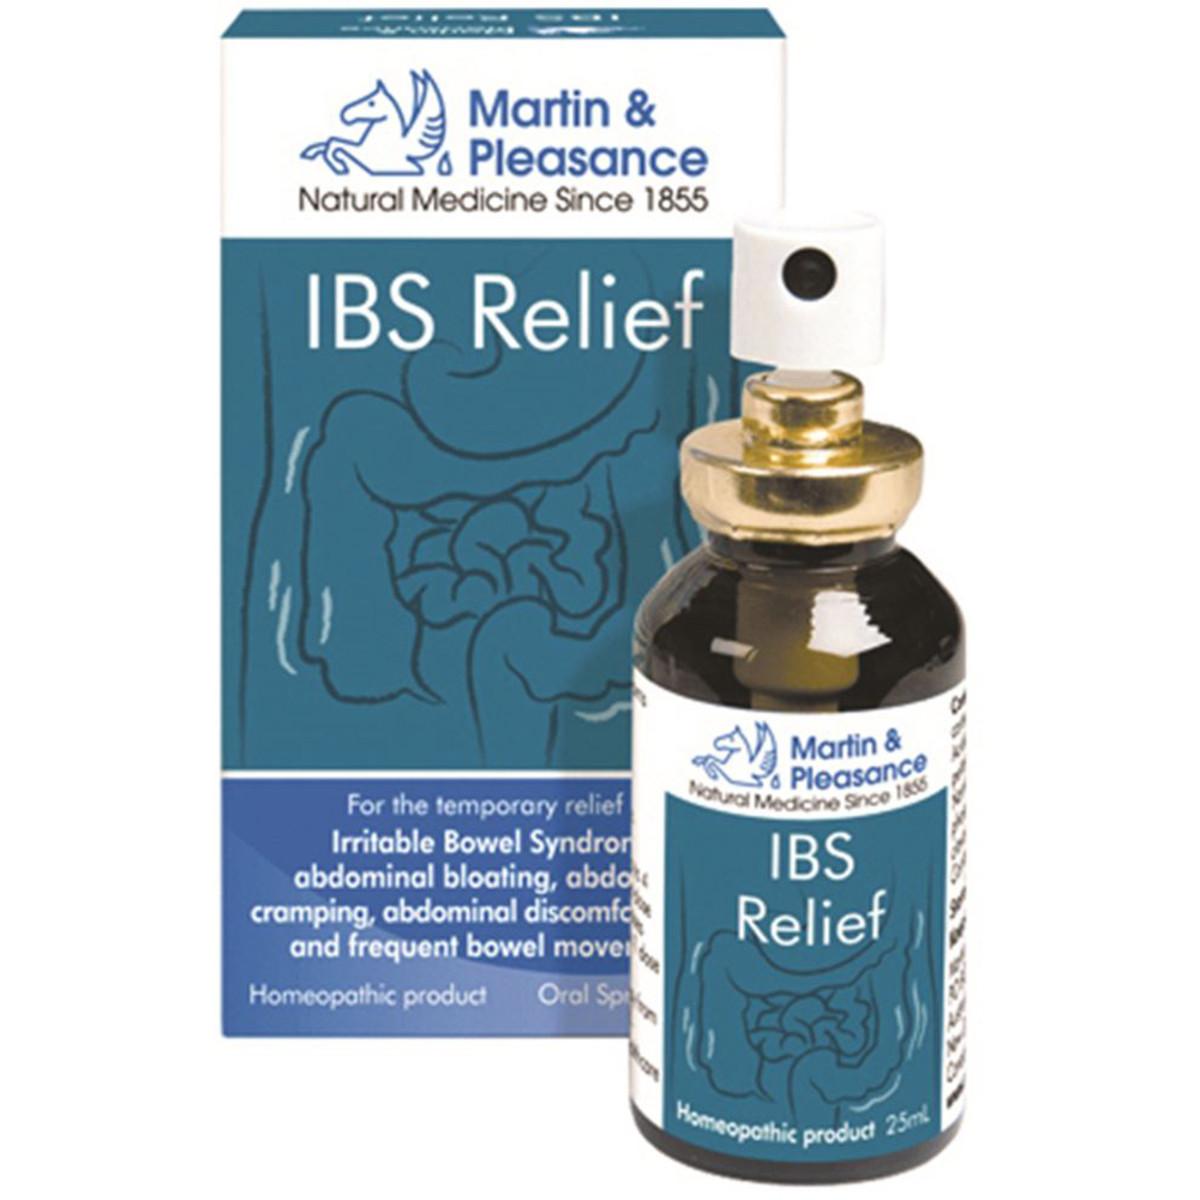 MARTIN & PLEASANCE IBS RELIEF ORAL SPRAY 25ML